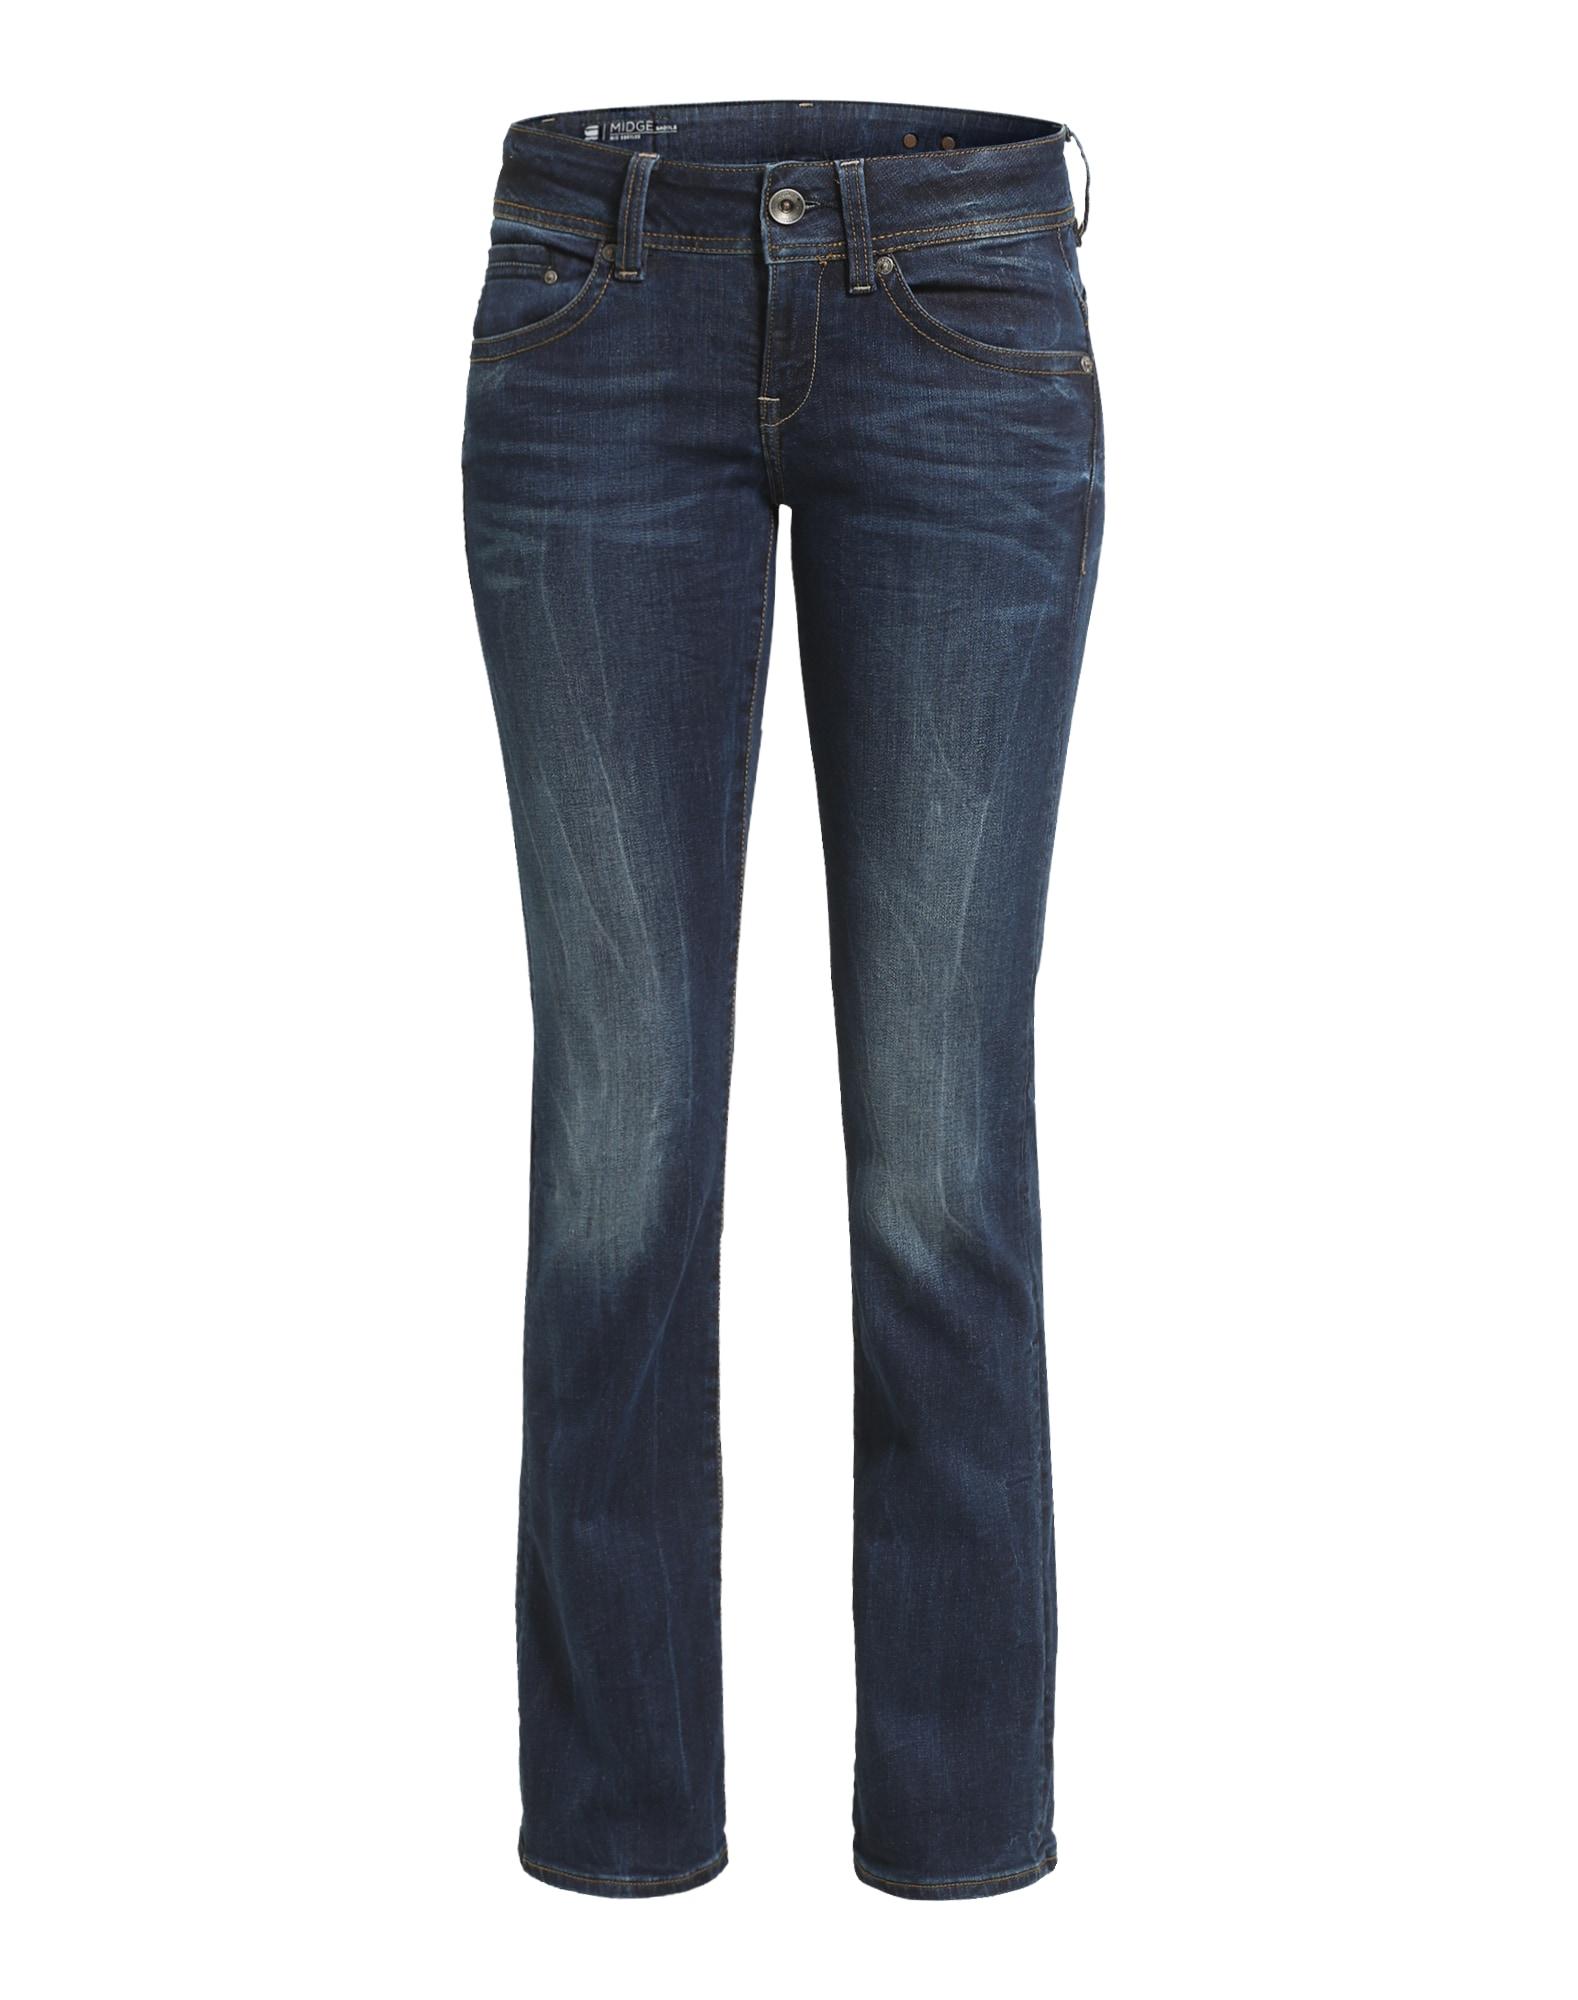 G-STAR RAW Dames Jeans Midge Saddle Mid Bootleg blauw